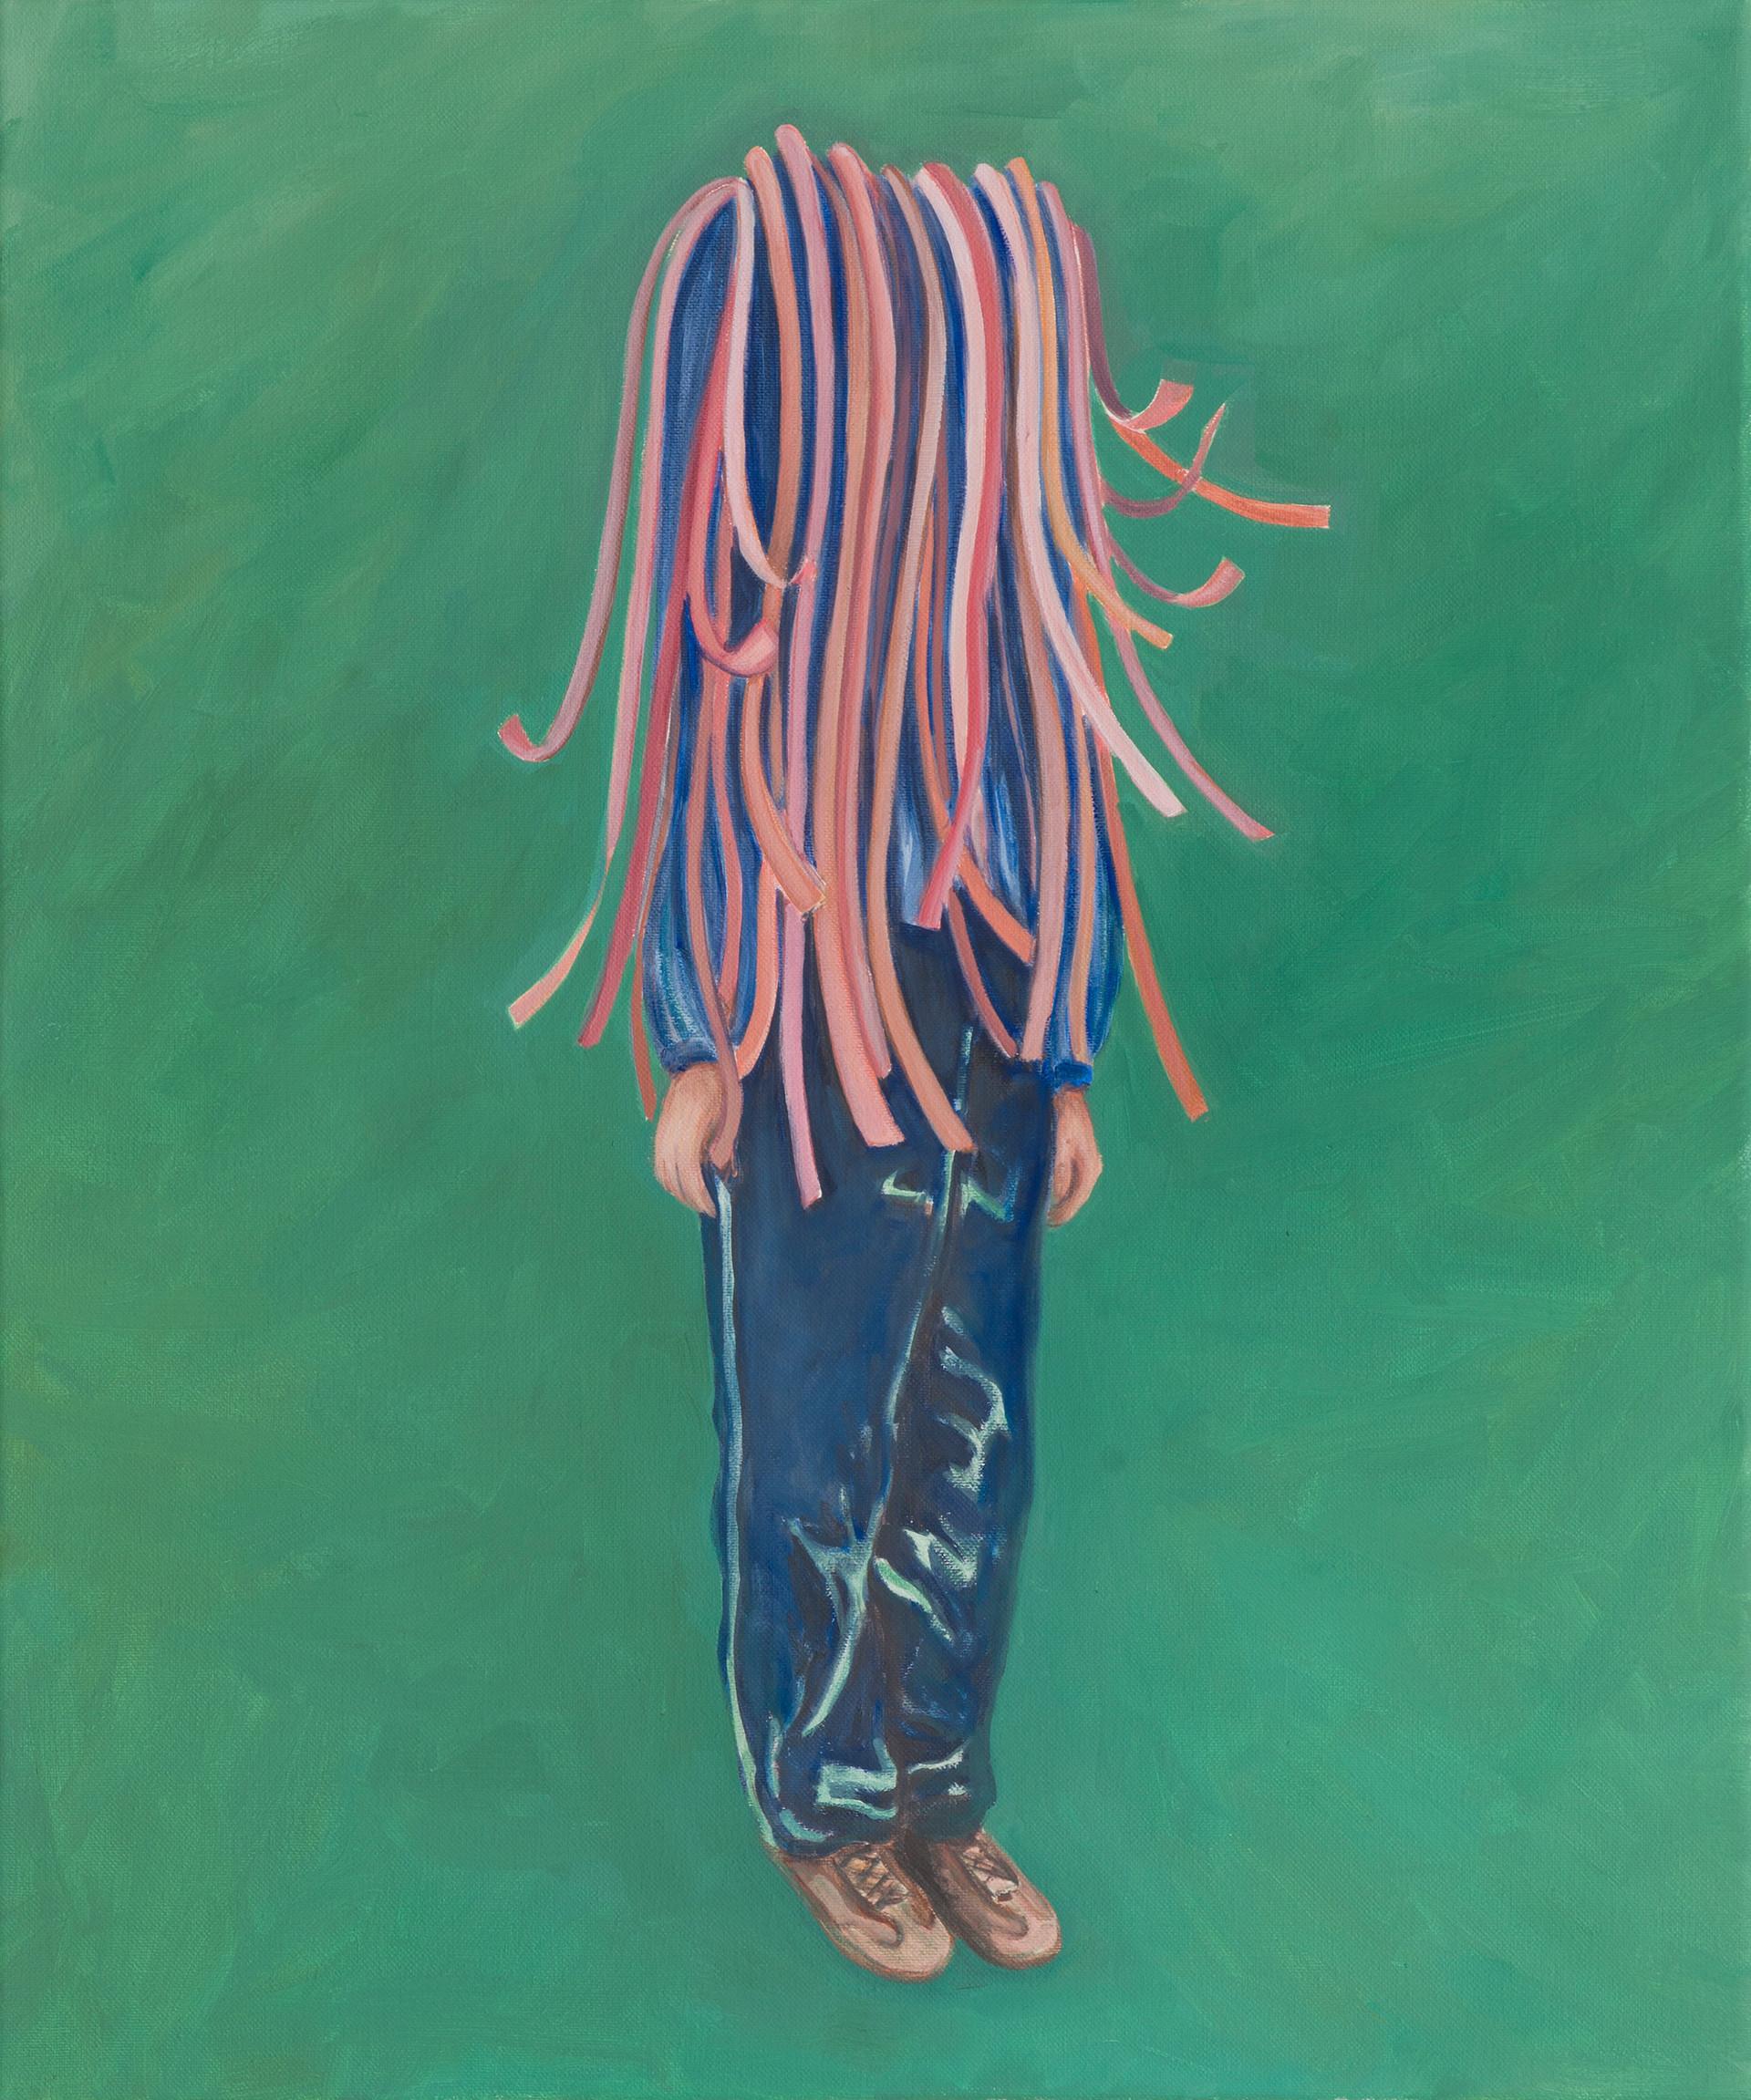 boy - 2014 - öl auf leinwand - 60 x 50 cm